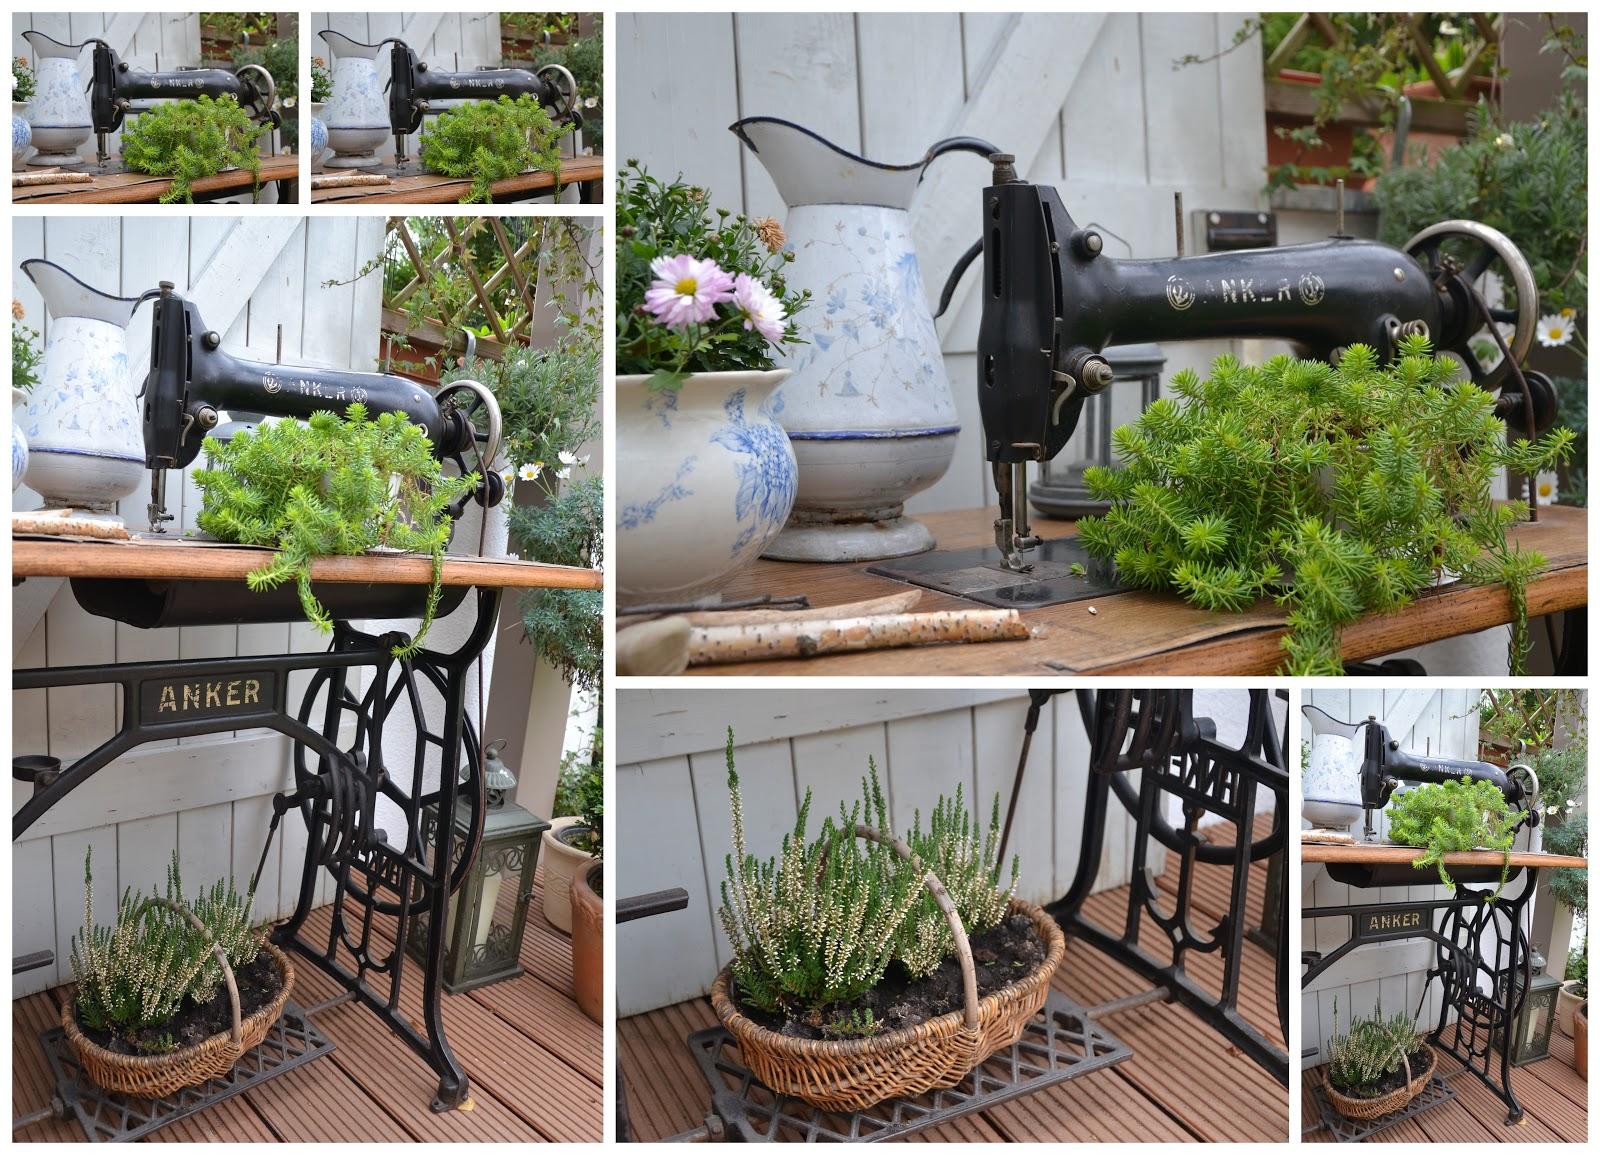 b tree kindern hmaschinensammlung. Black Bedroom Furniture Sets. Home Design Ideas